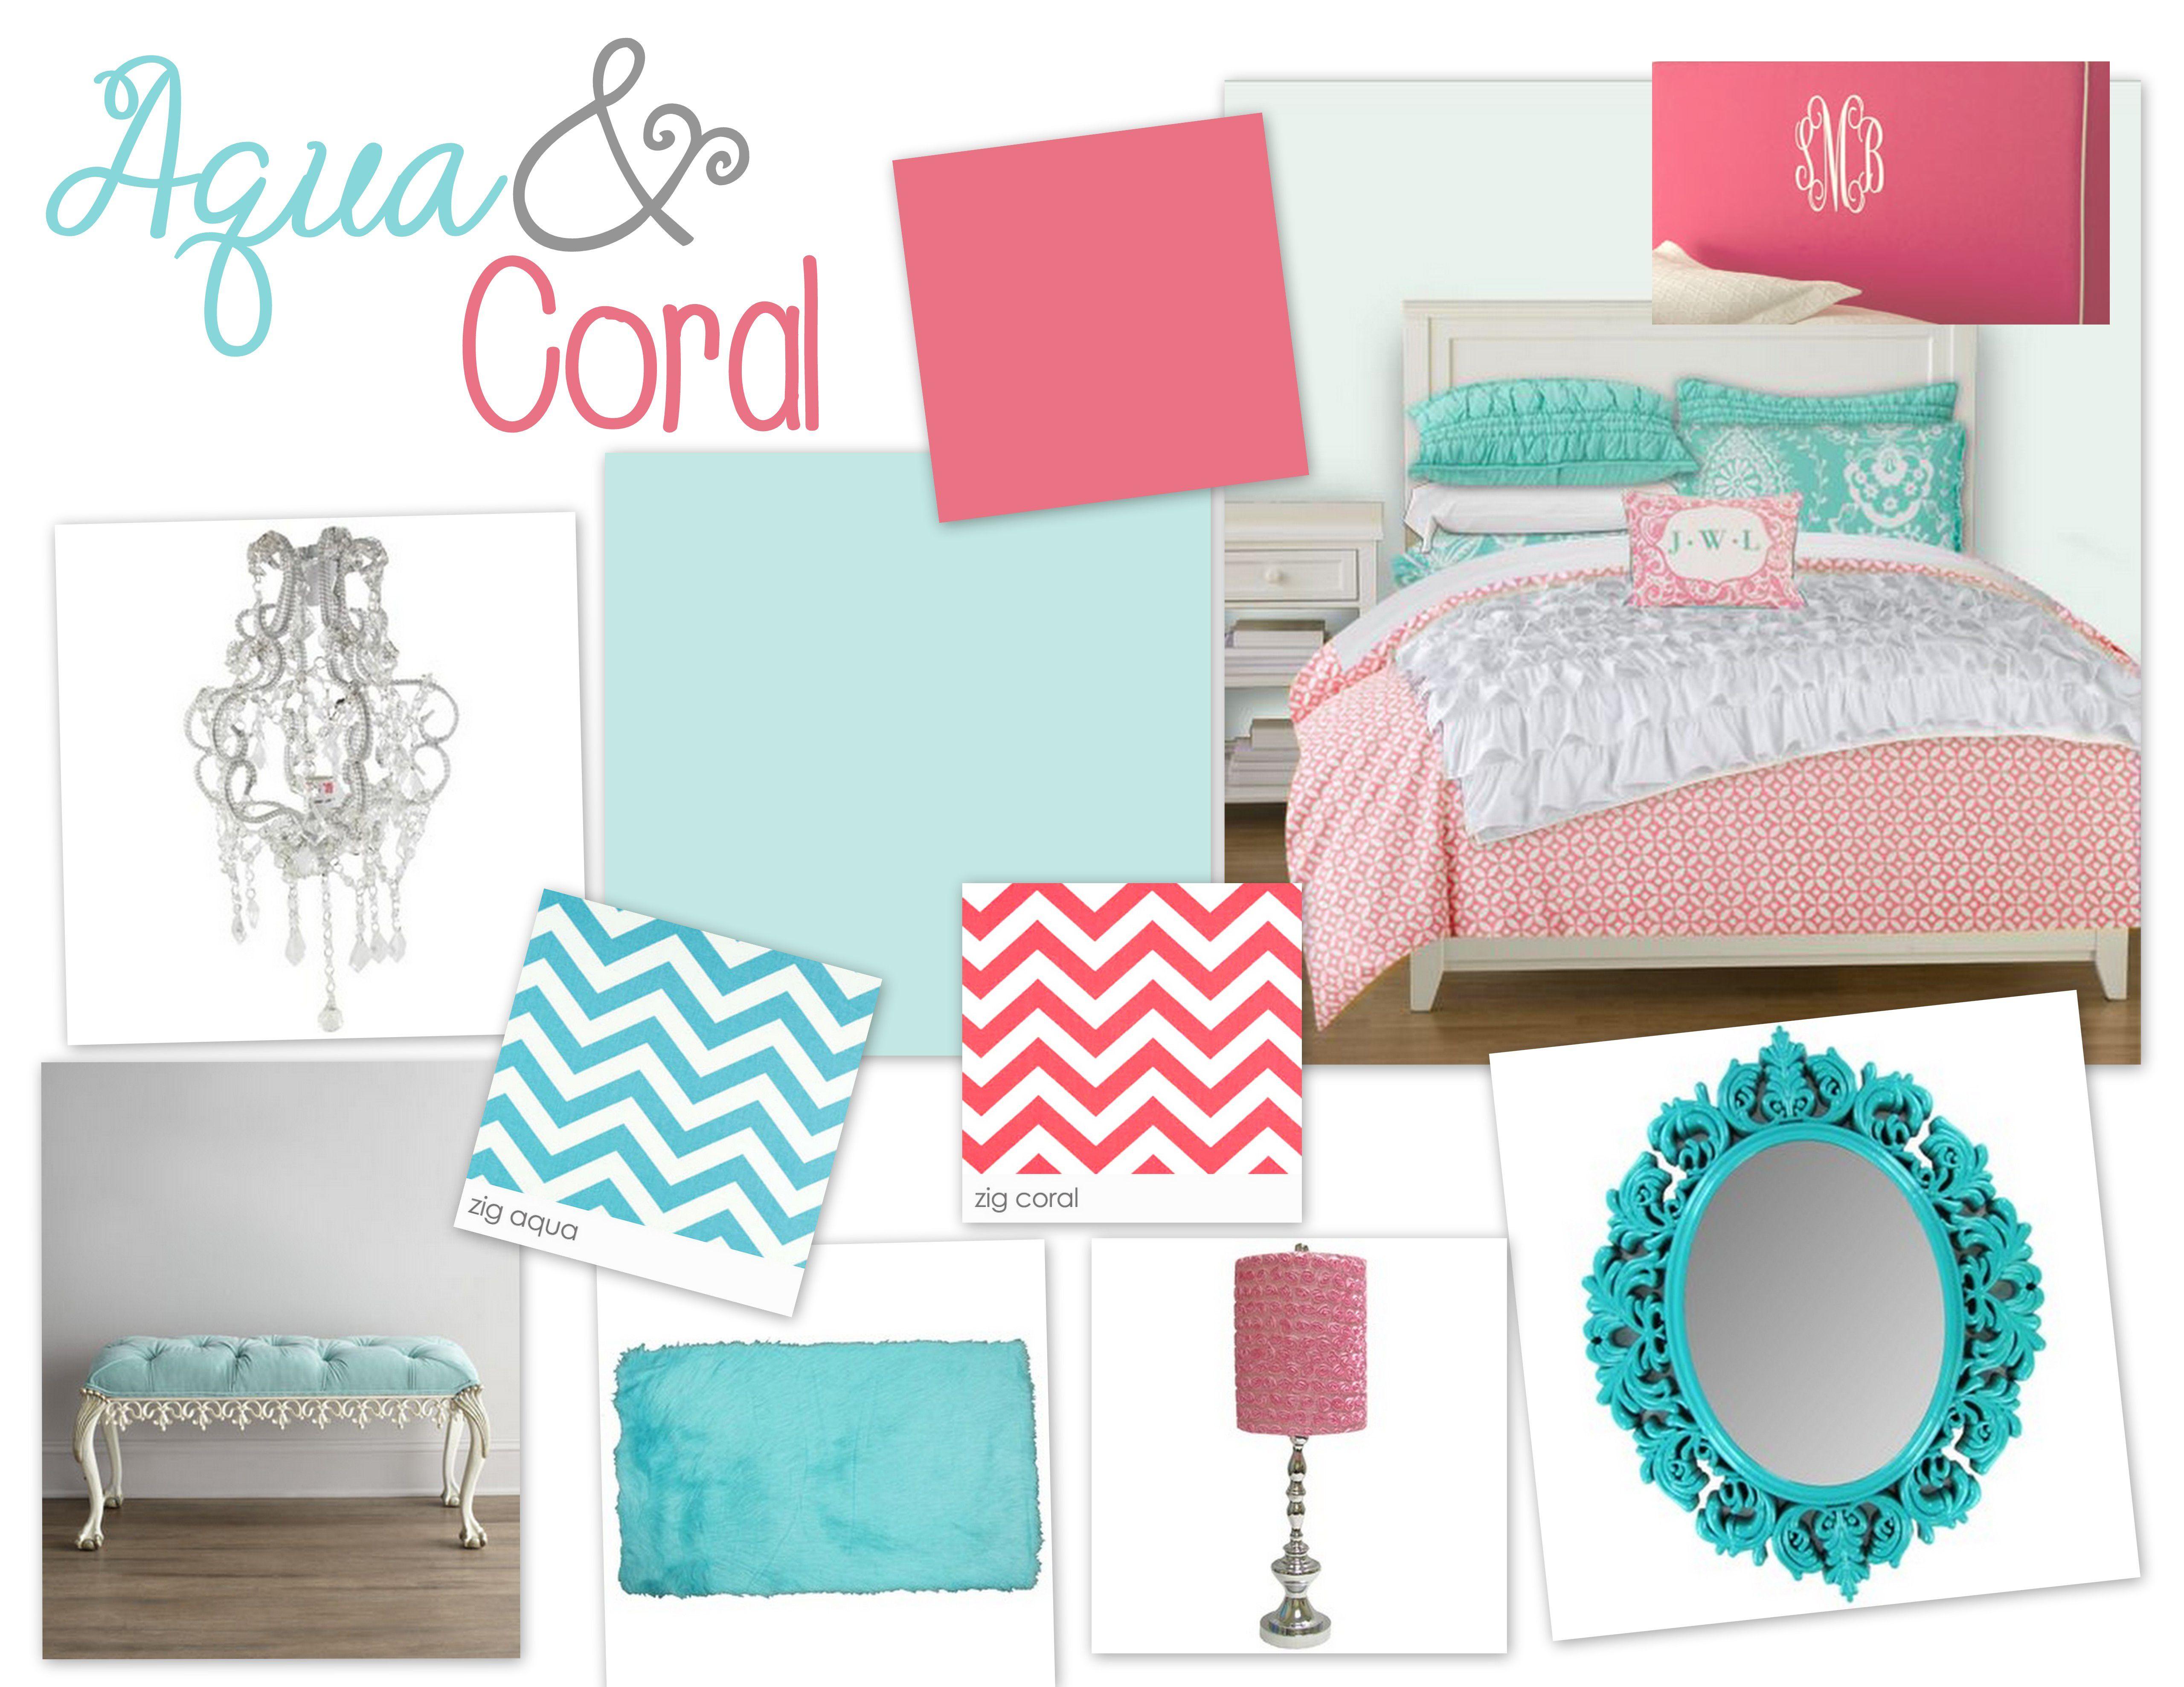 Aqua U0026 Coral Bedroom  Guest Bedroom Color Scheme!! Have The Coral And